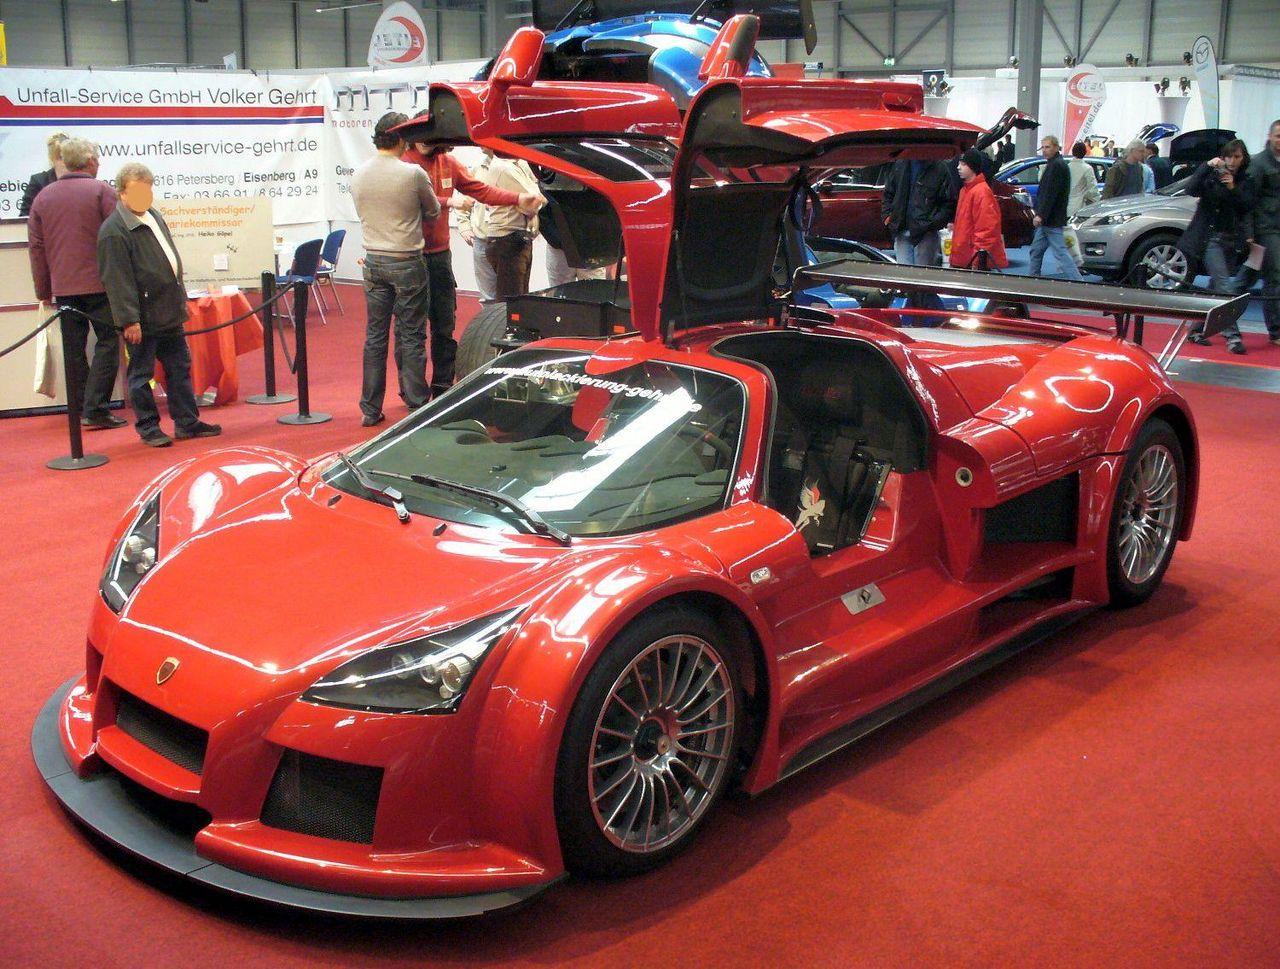 Bild Automobilmesse Erfurt